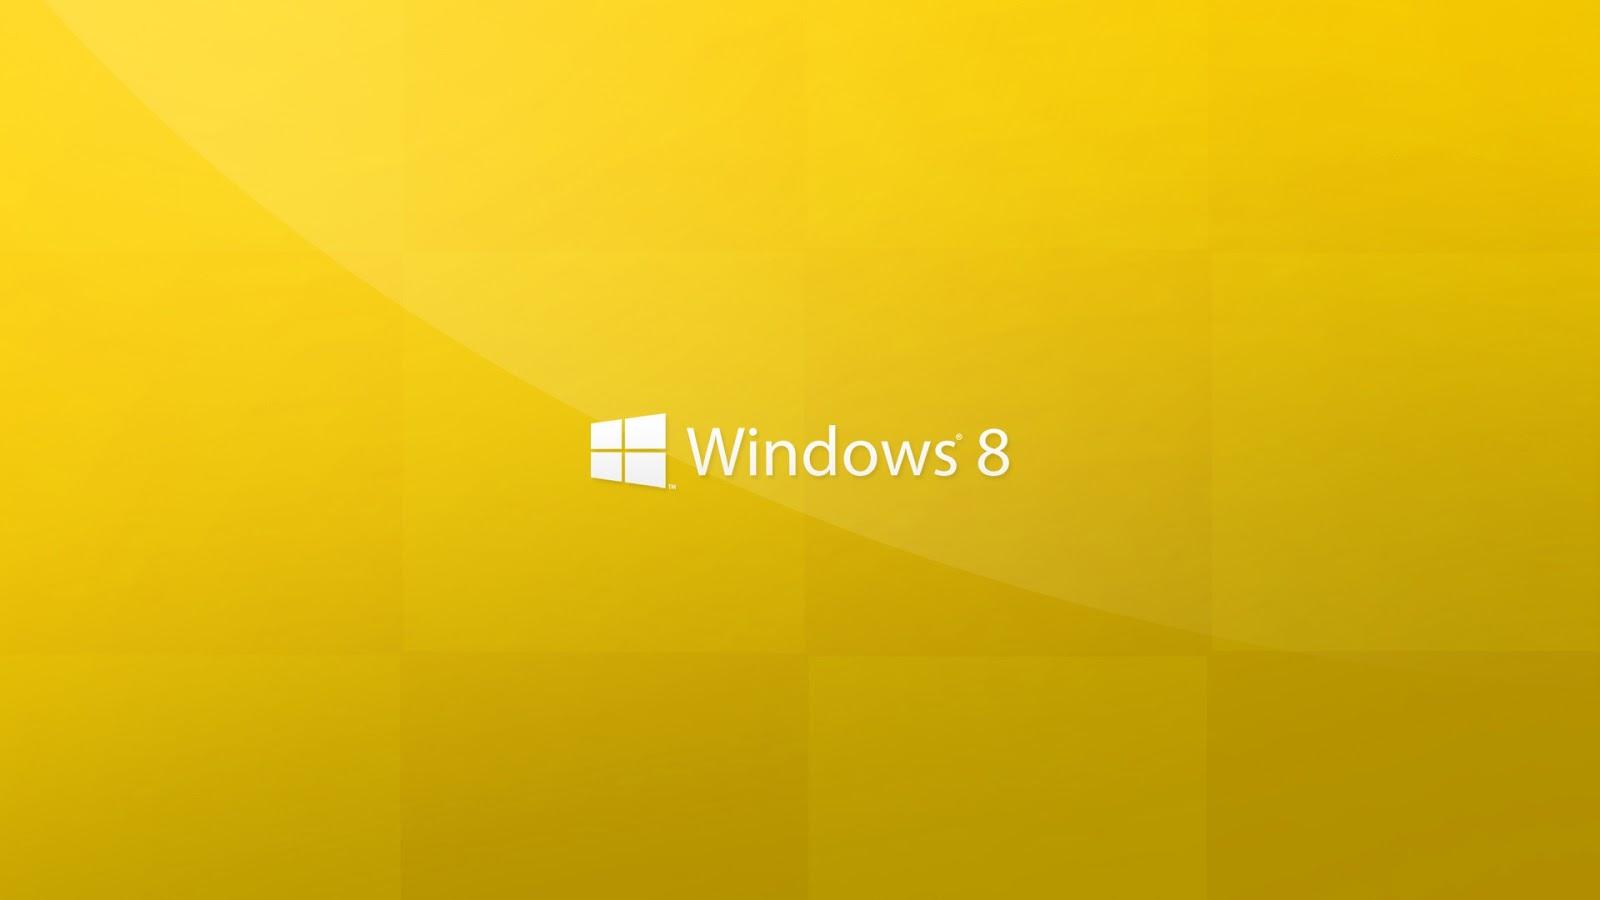 Microsoft Windows HD Desktop Wallpaper Amazing Wallpaperz 1600x900